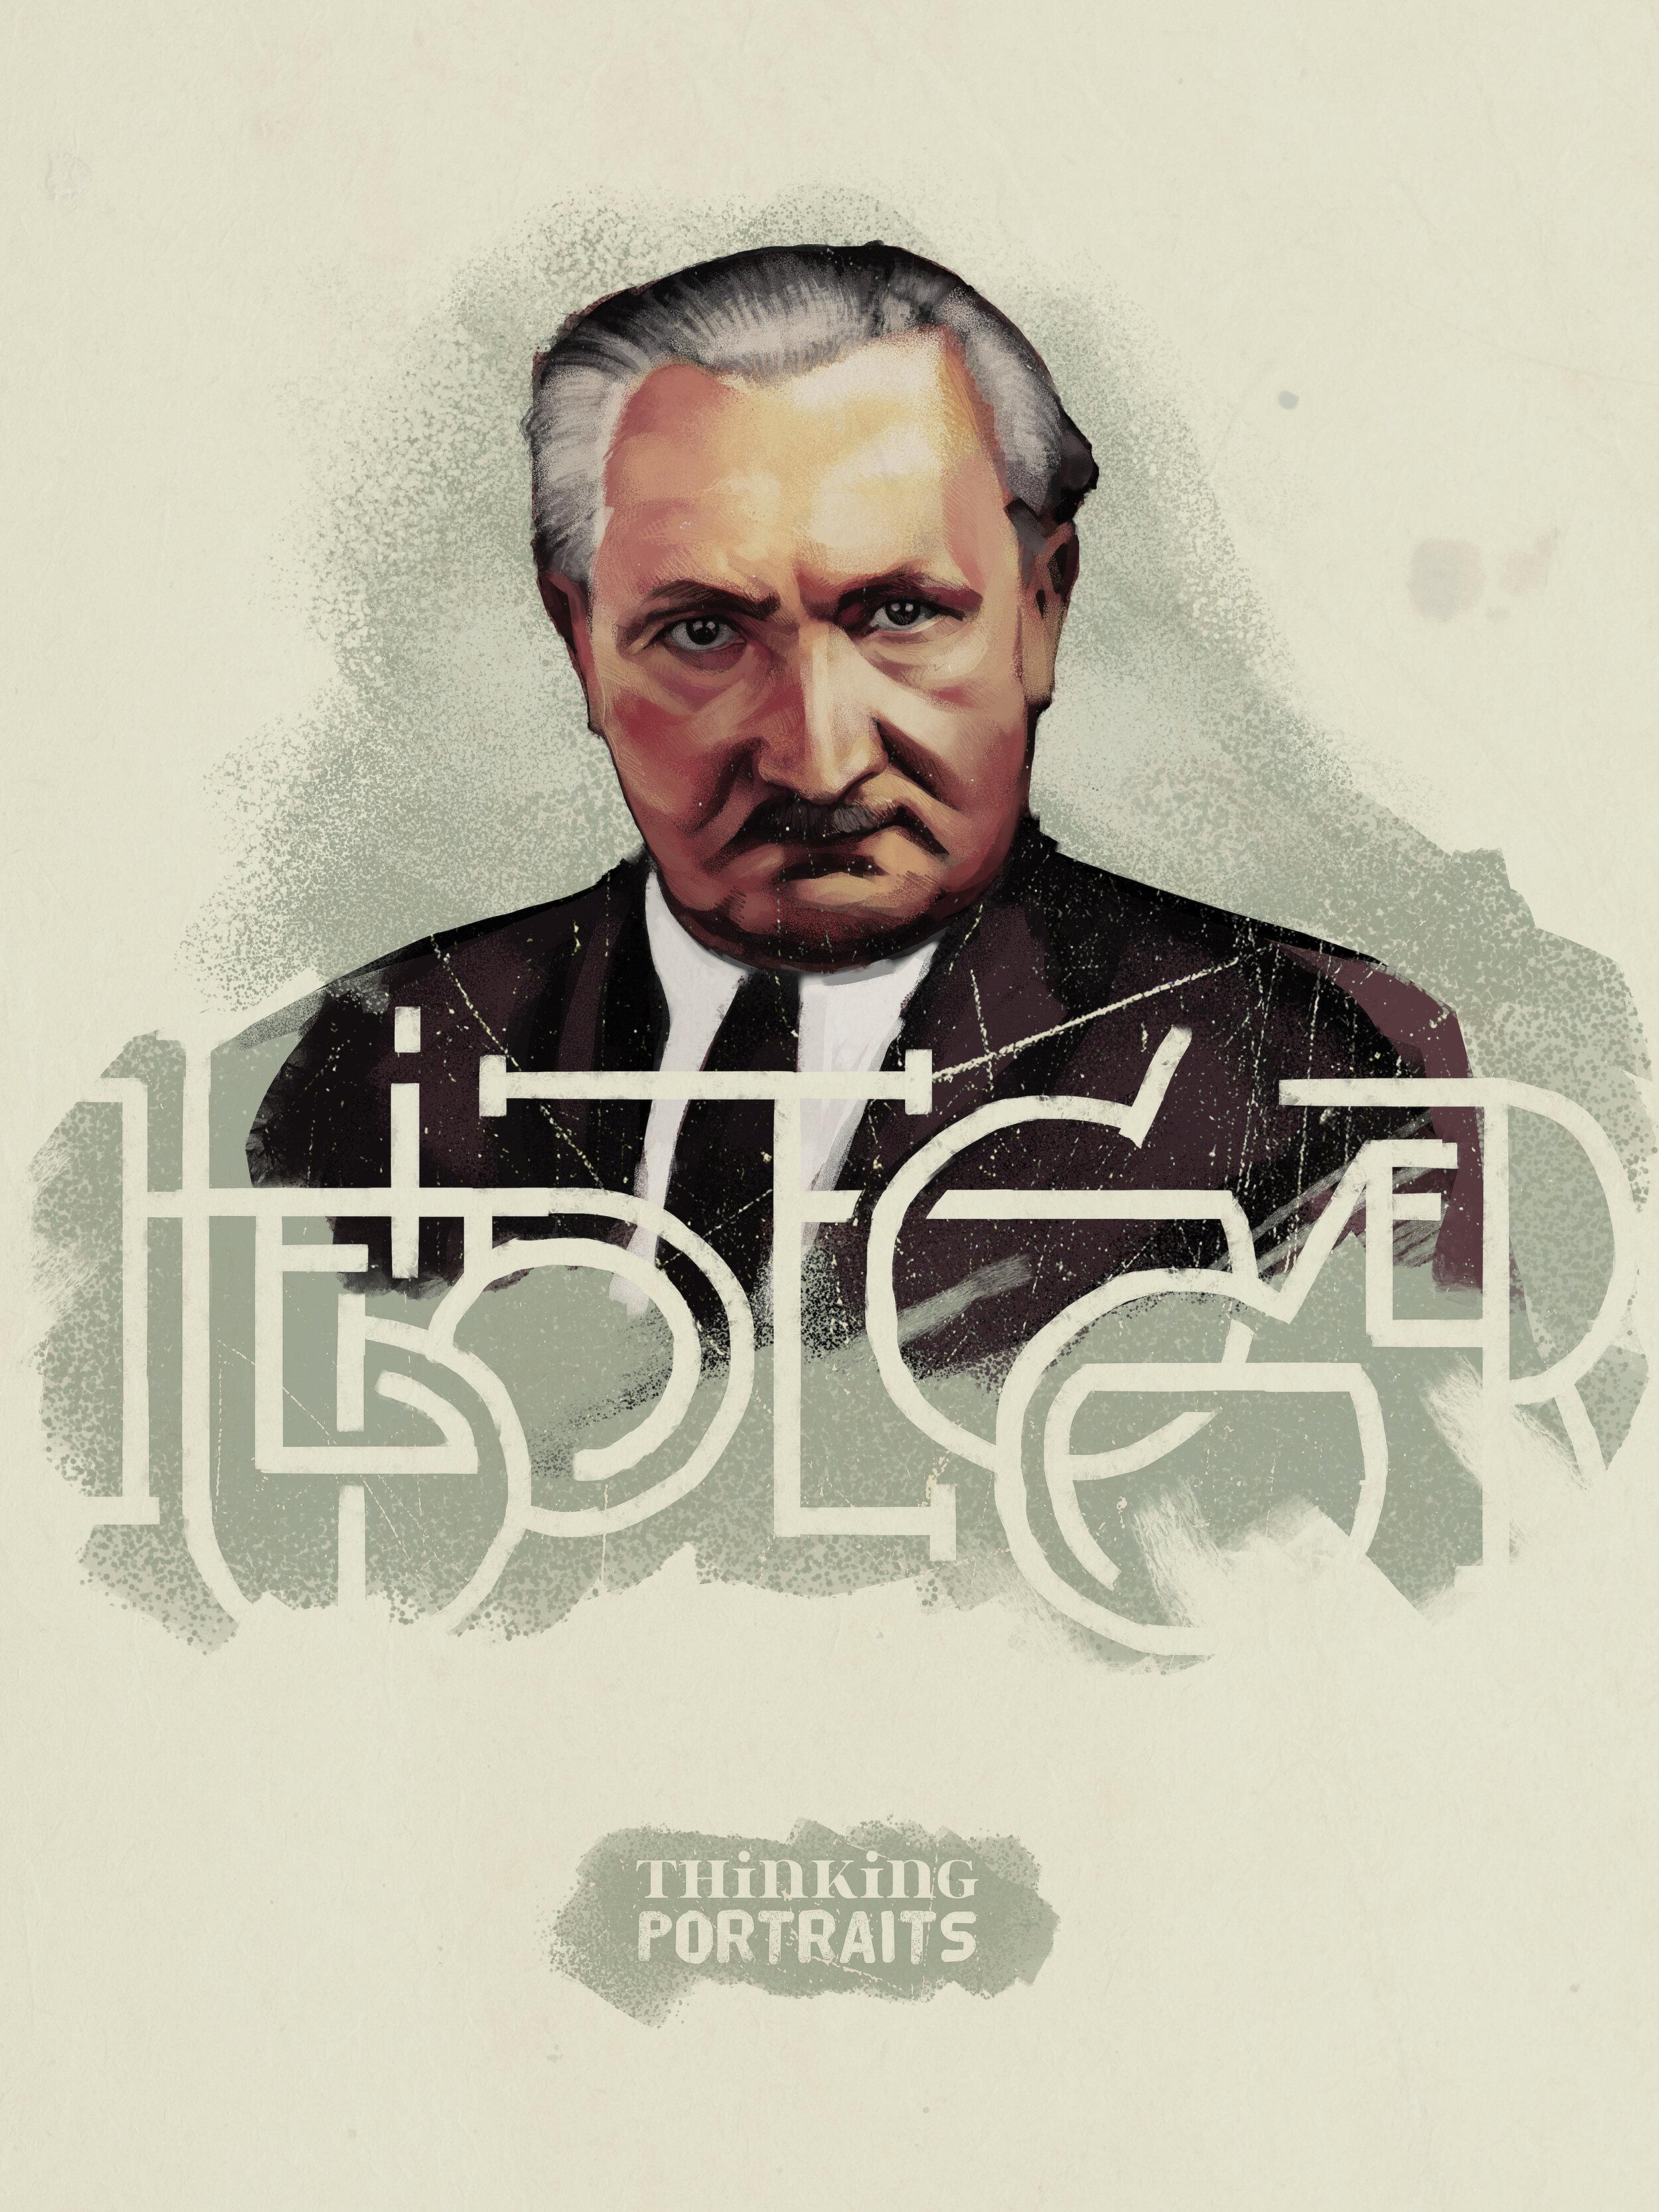 PRINT_Heidegger_3000x4000_RGB_300dpi.jpg